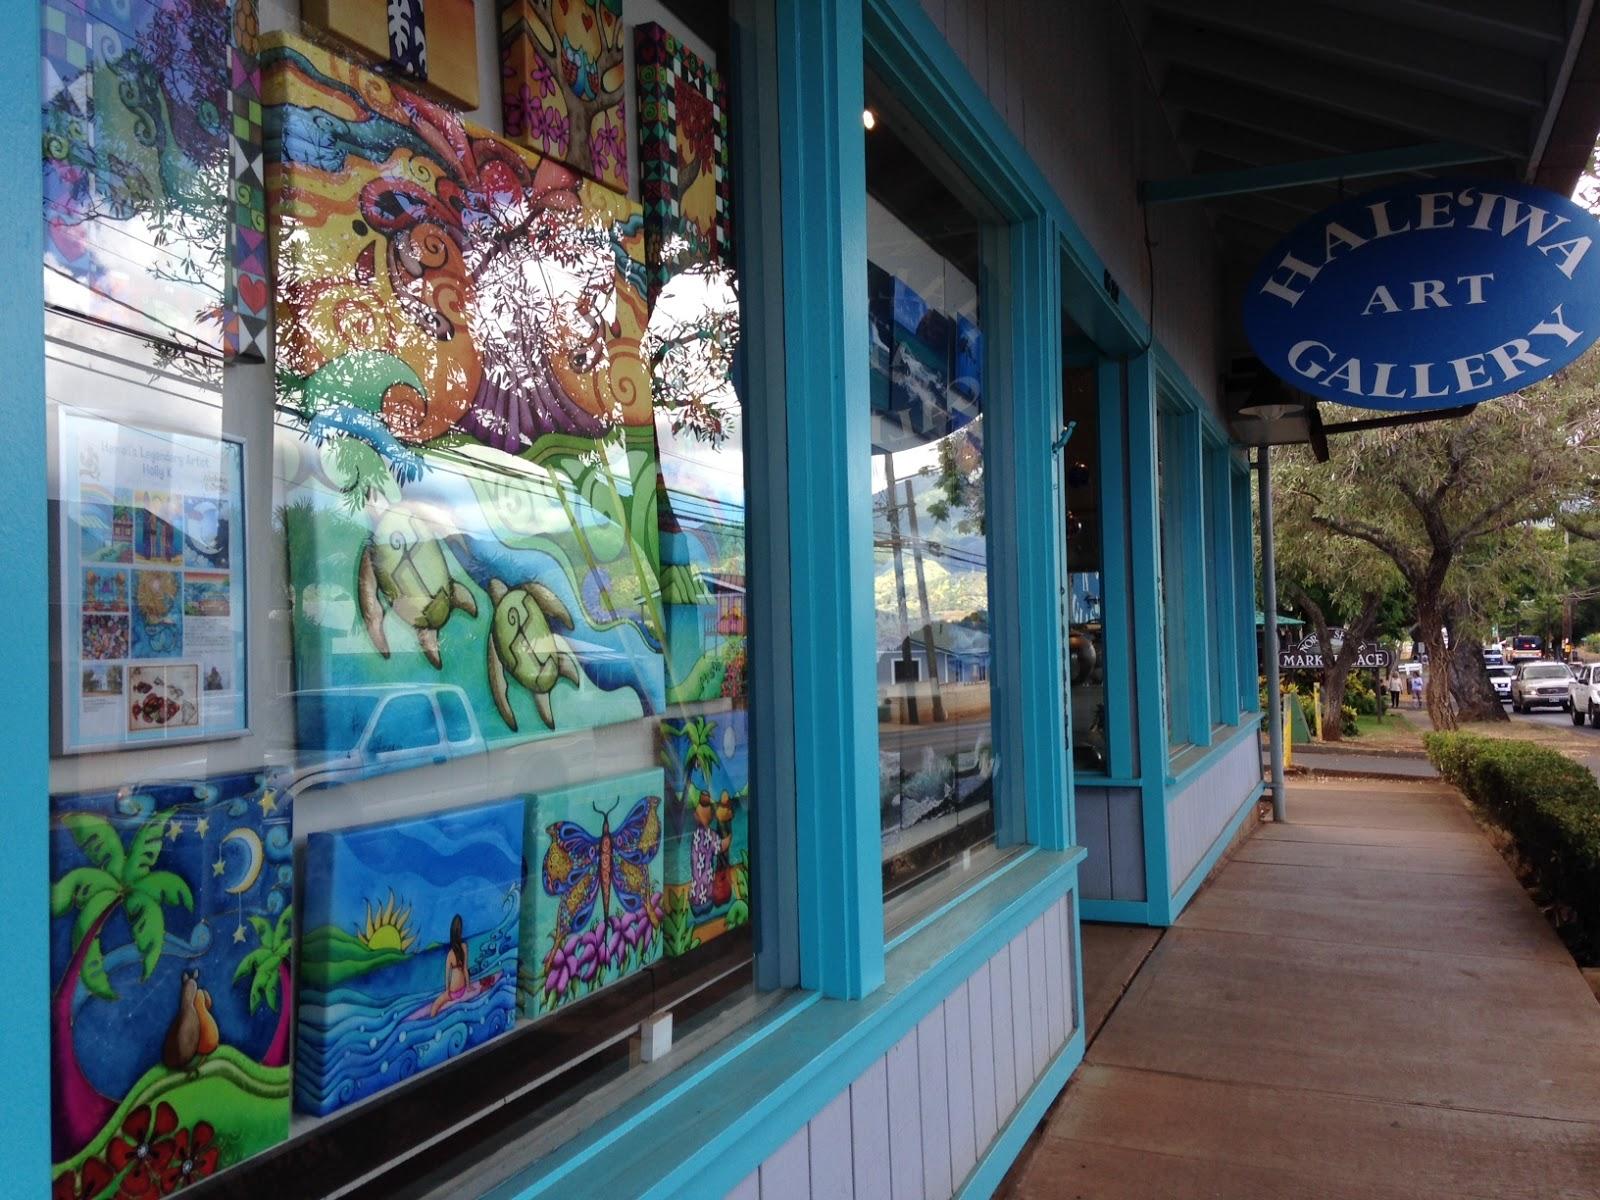 Holly Kitaura Art Haleiwa Art Gallery on the North Shore